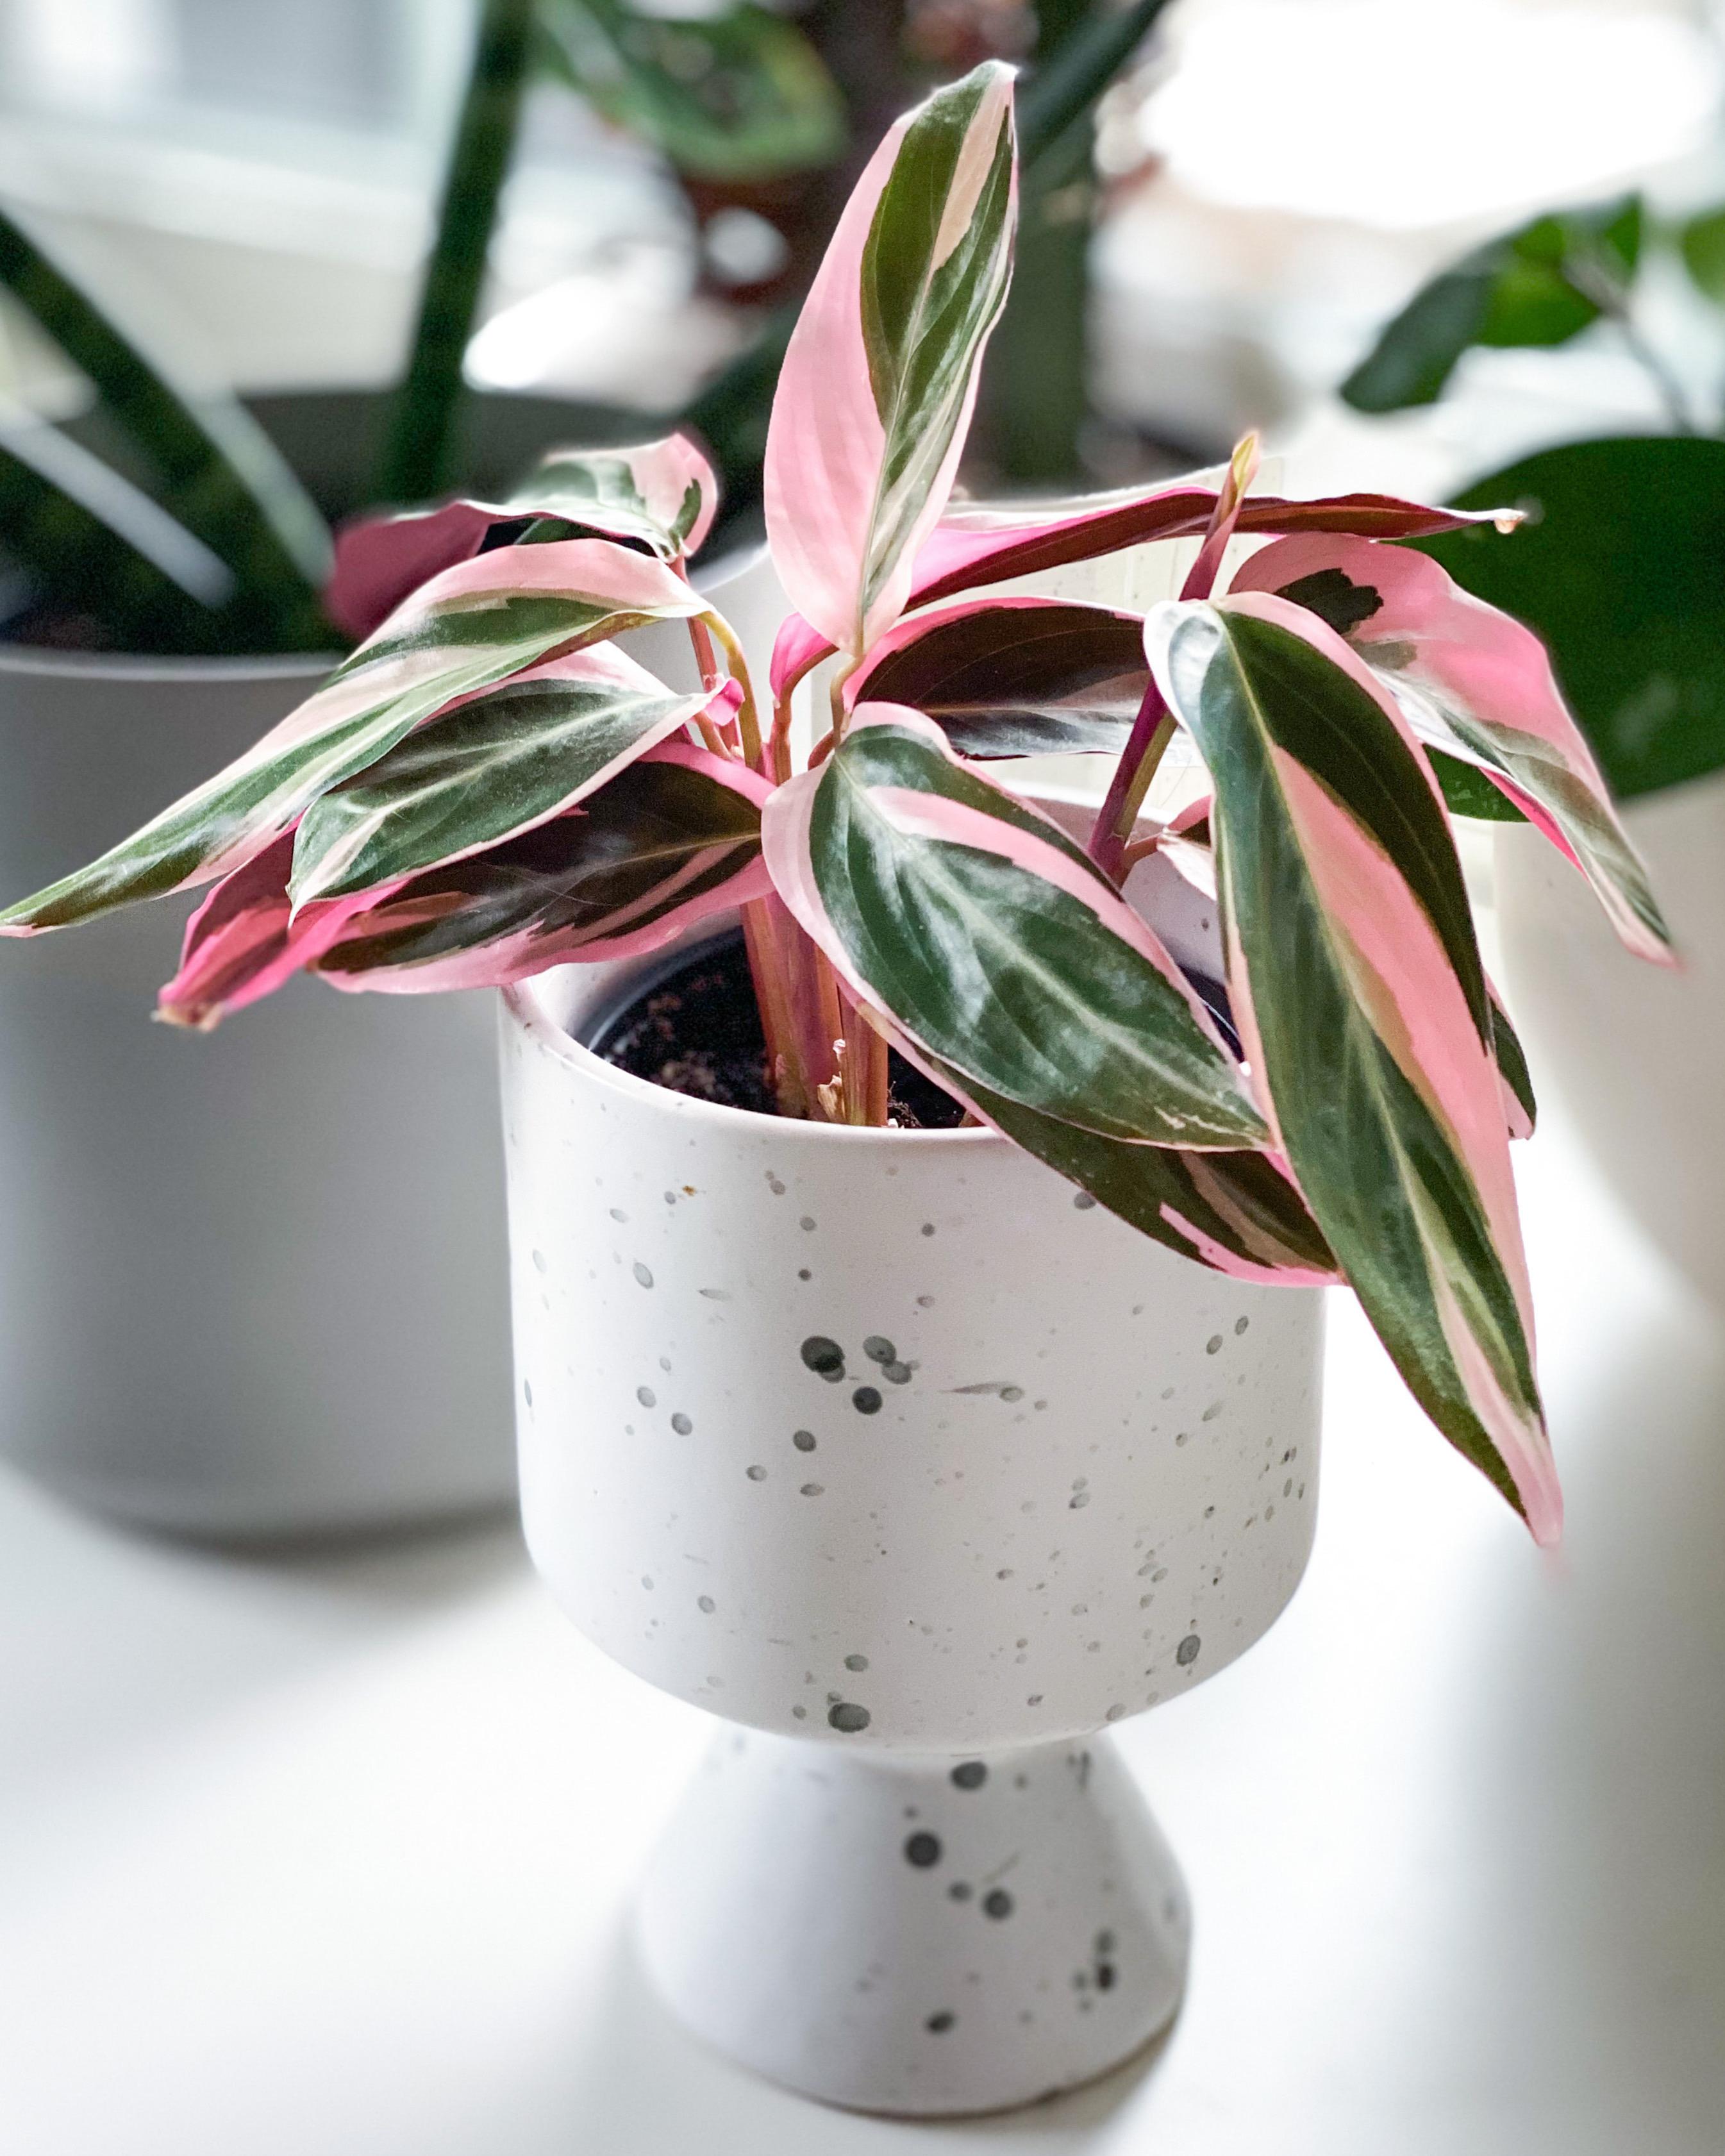 piante-da-appartamento-colorate-stromanhte-triostar-Evelyn-Sisco-@greenwithevy